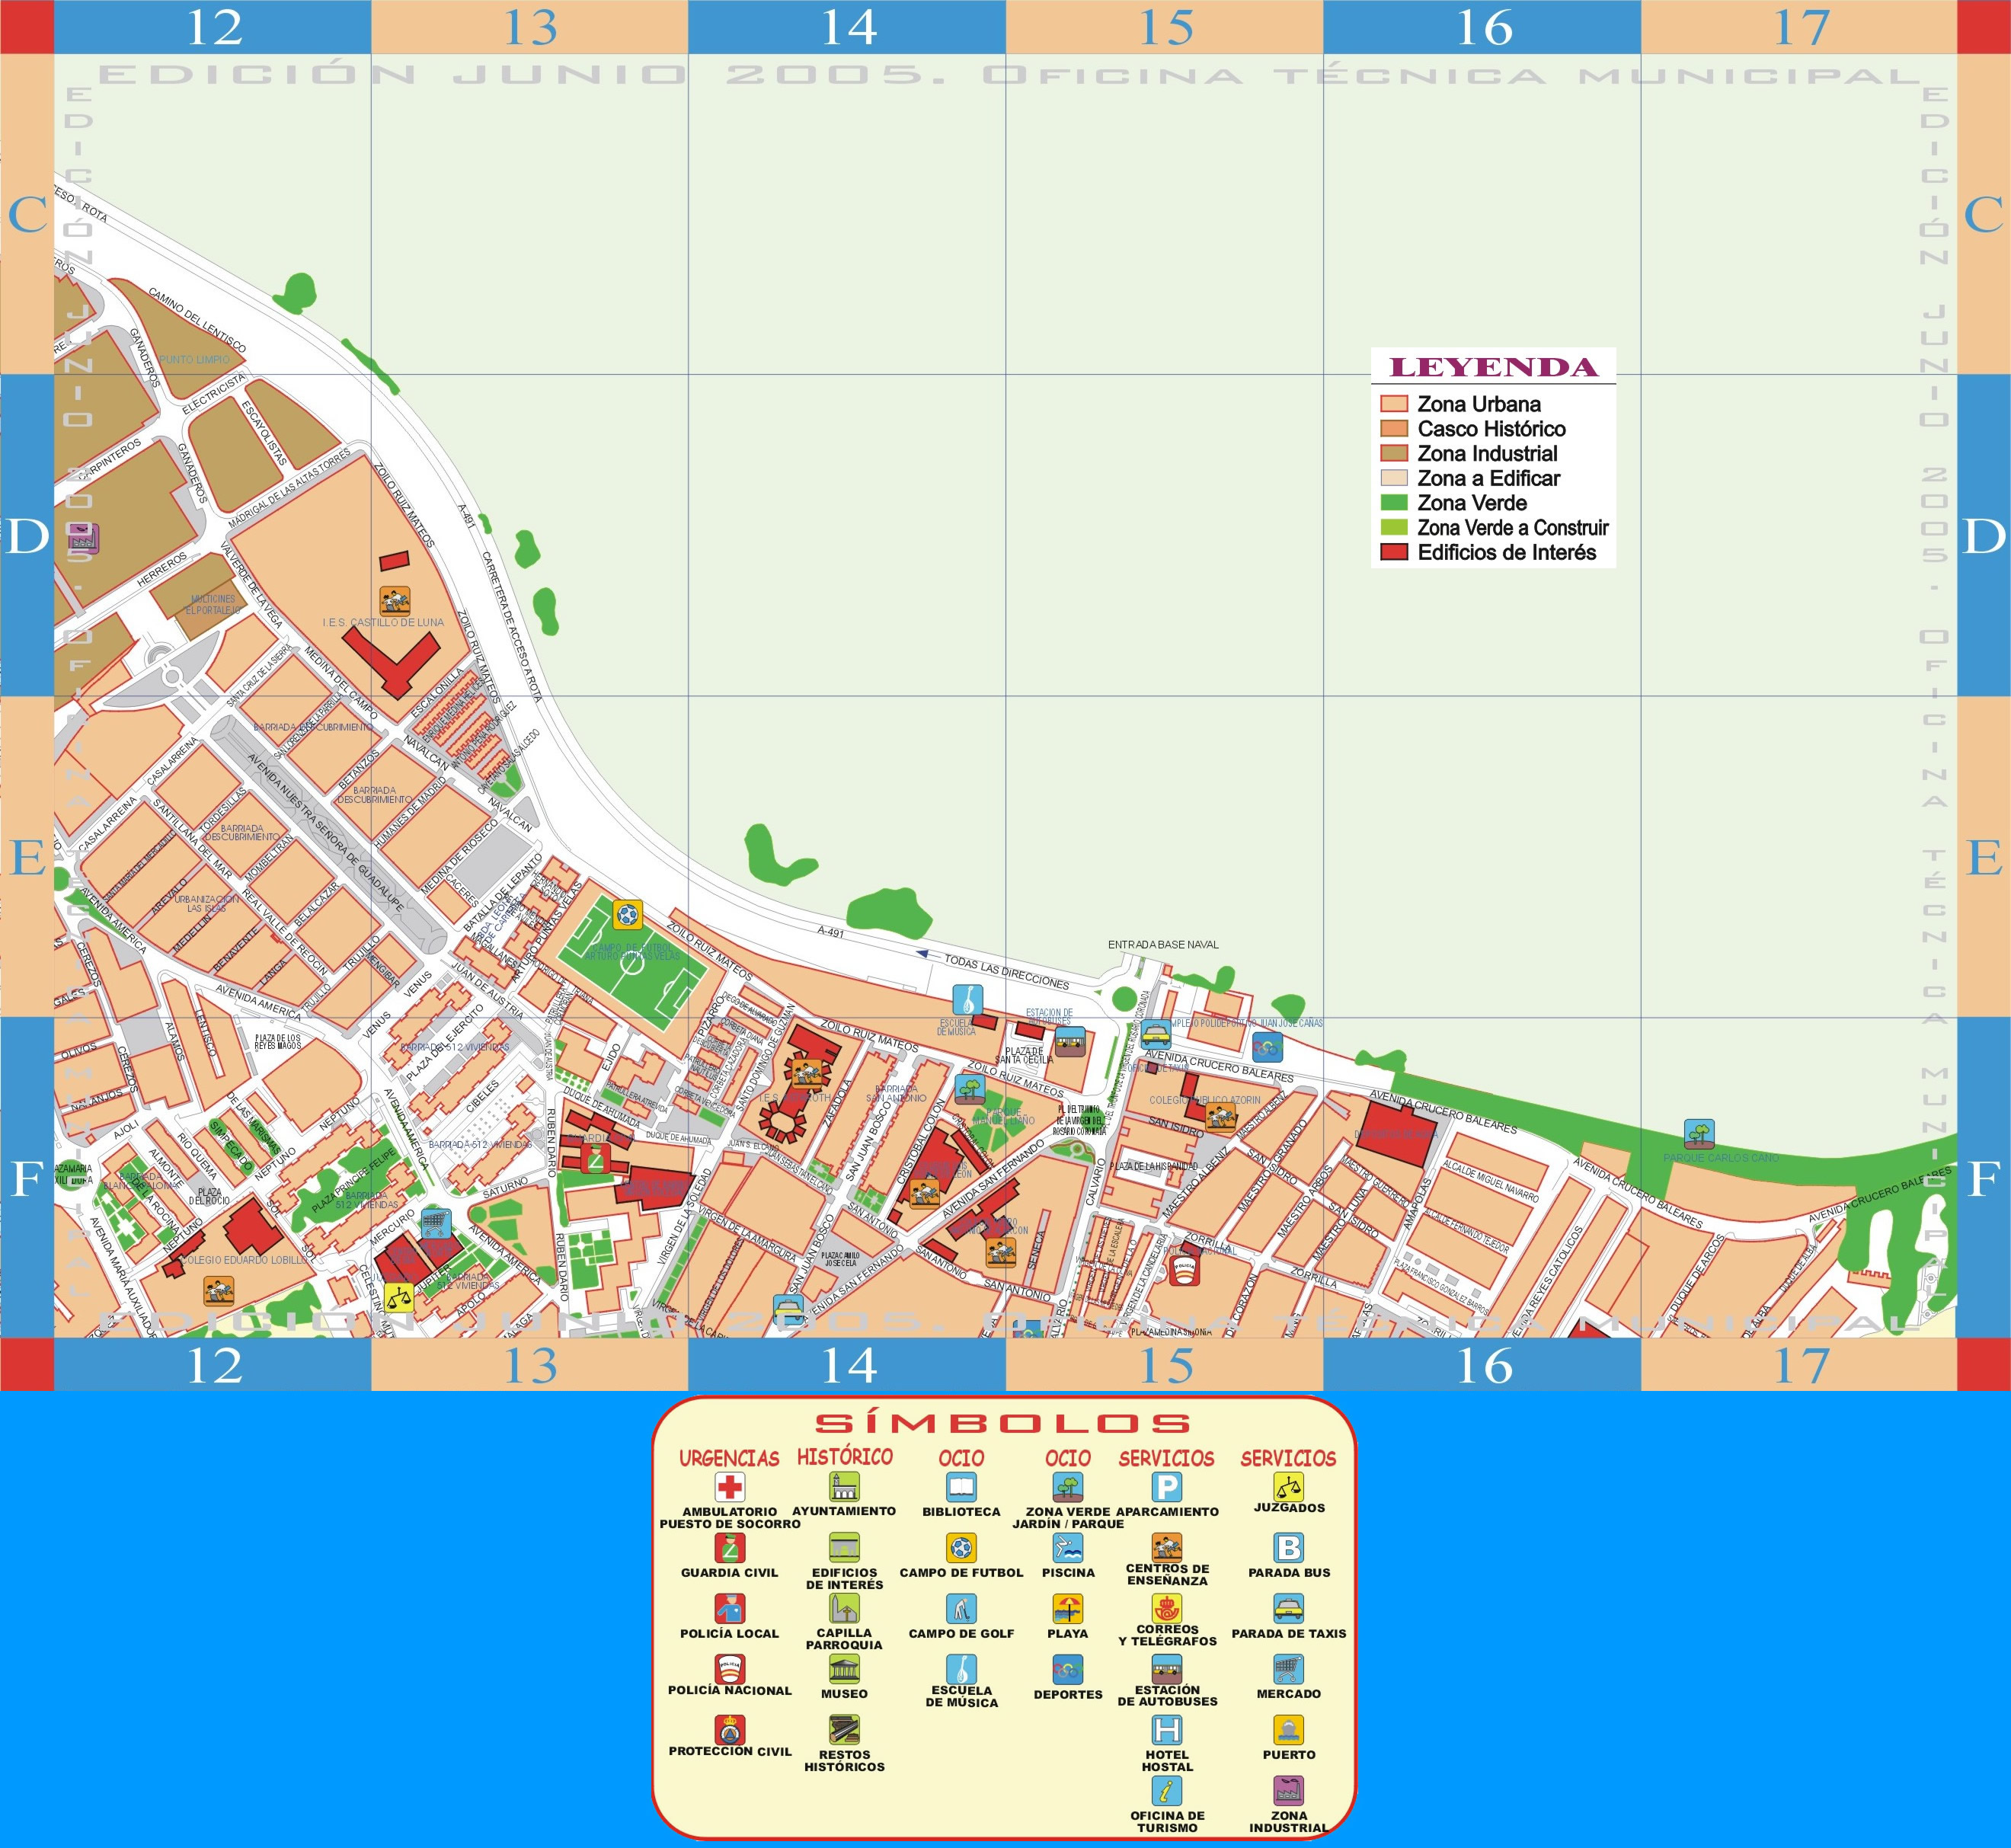 Rota map 2005 - part 3